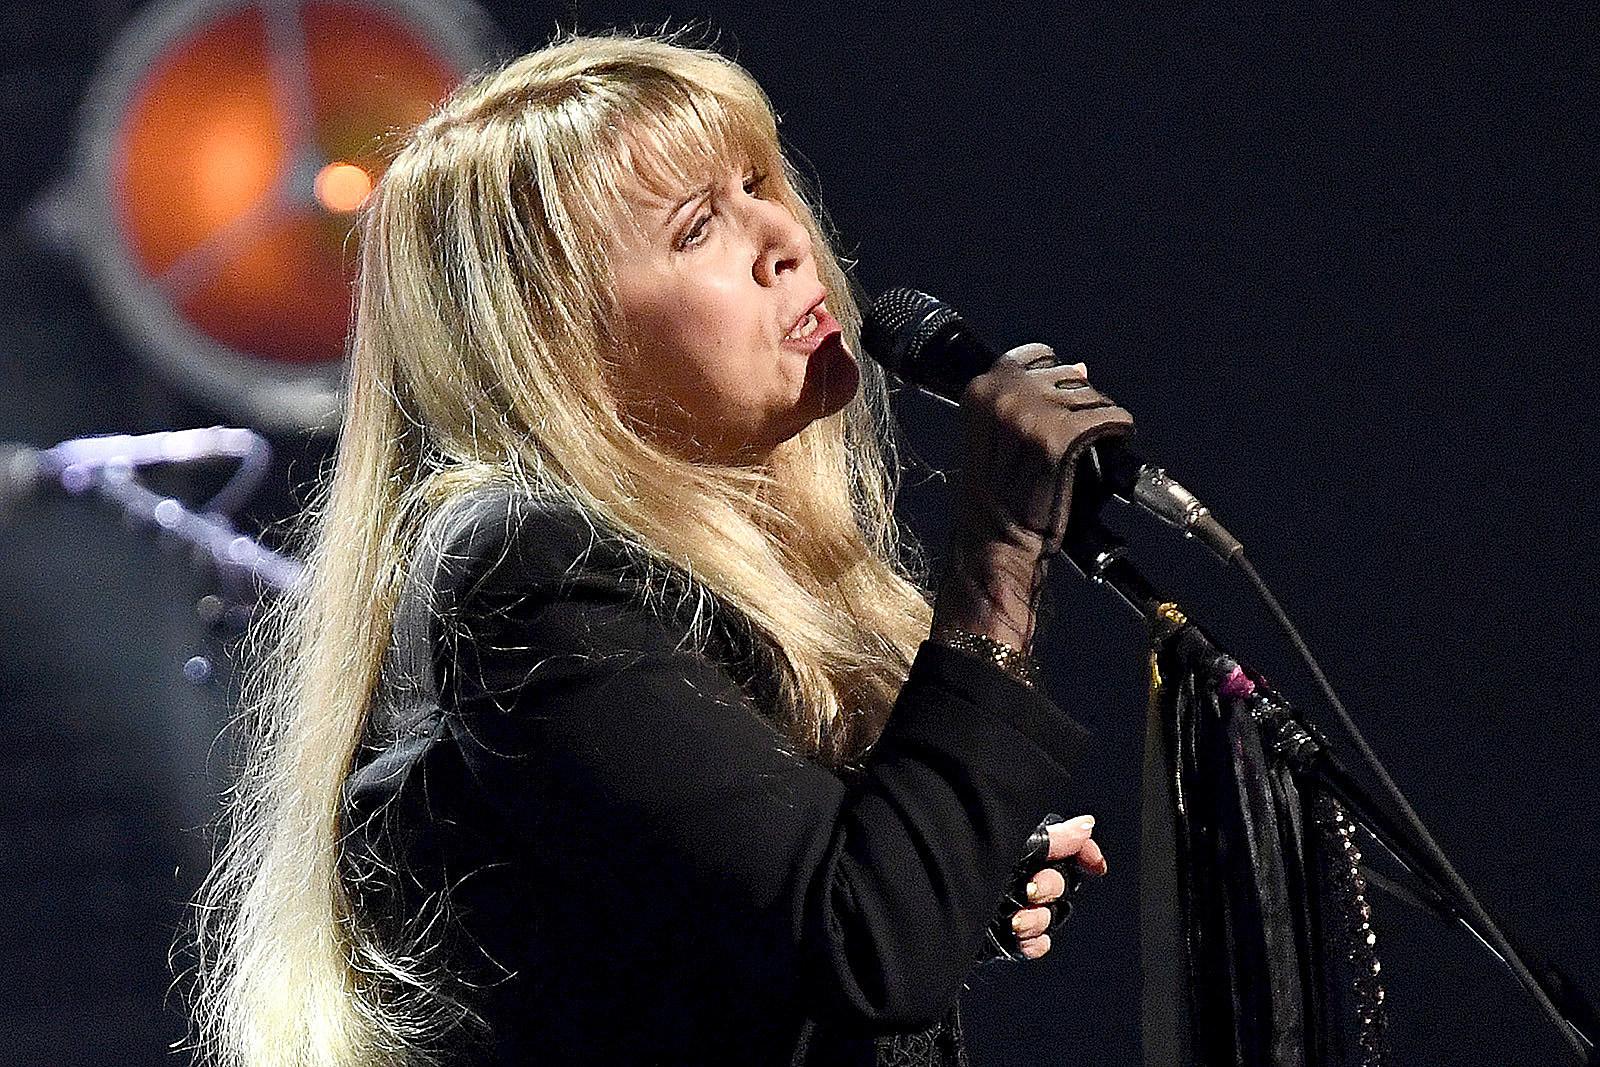 Stevie Nicks Says Her Debut Solo LP Kept Fleetwood Mac 'Together'